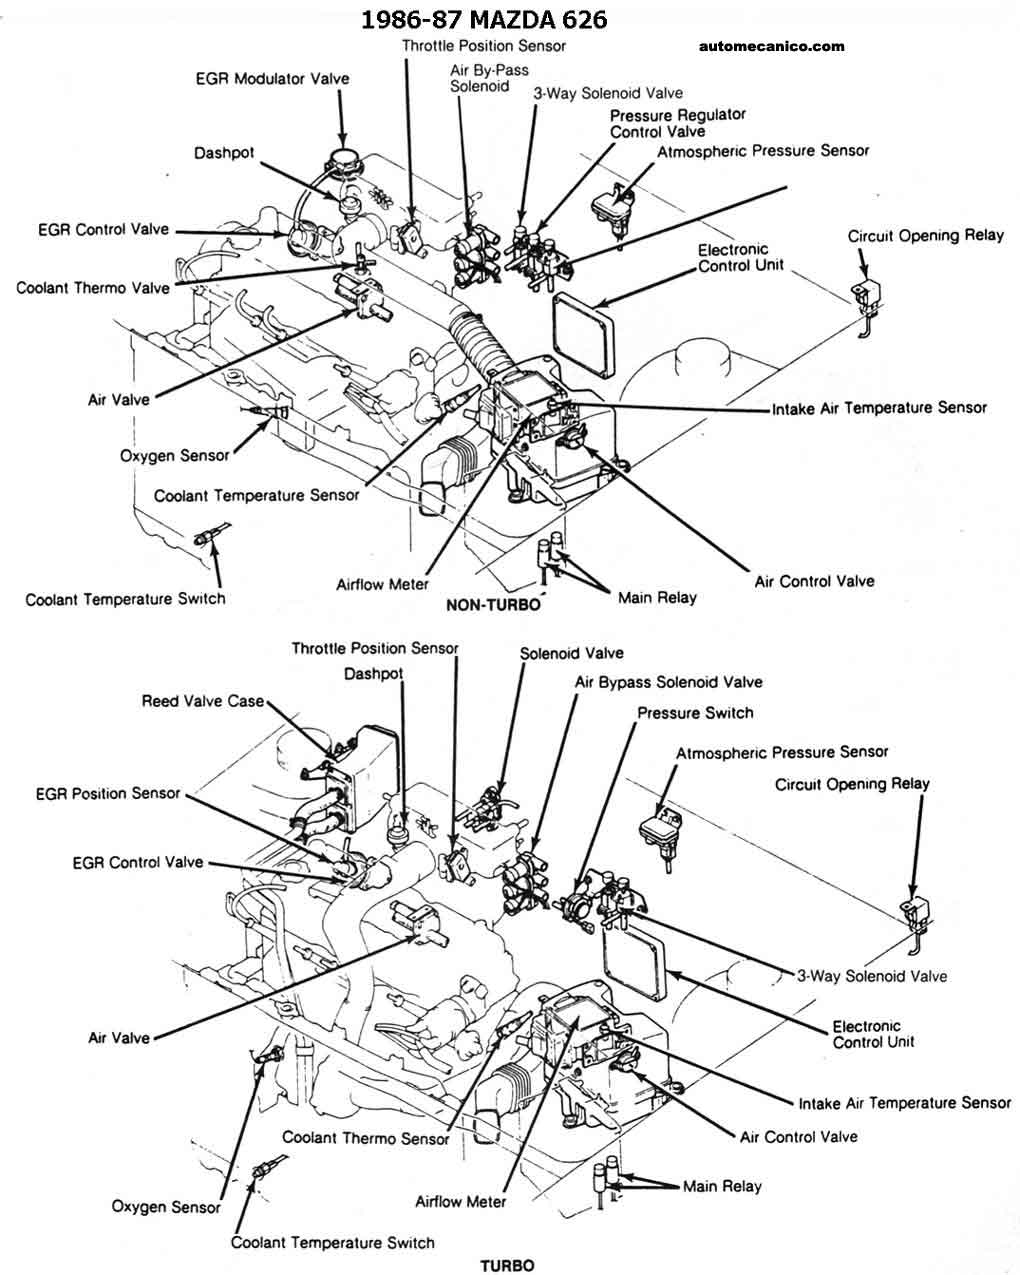 Sevende Mazda B2200 Ao 1990 Precio 2300 Omo B2000 Wiring Diagram Wiringdiagram